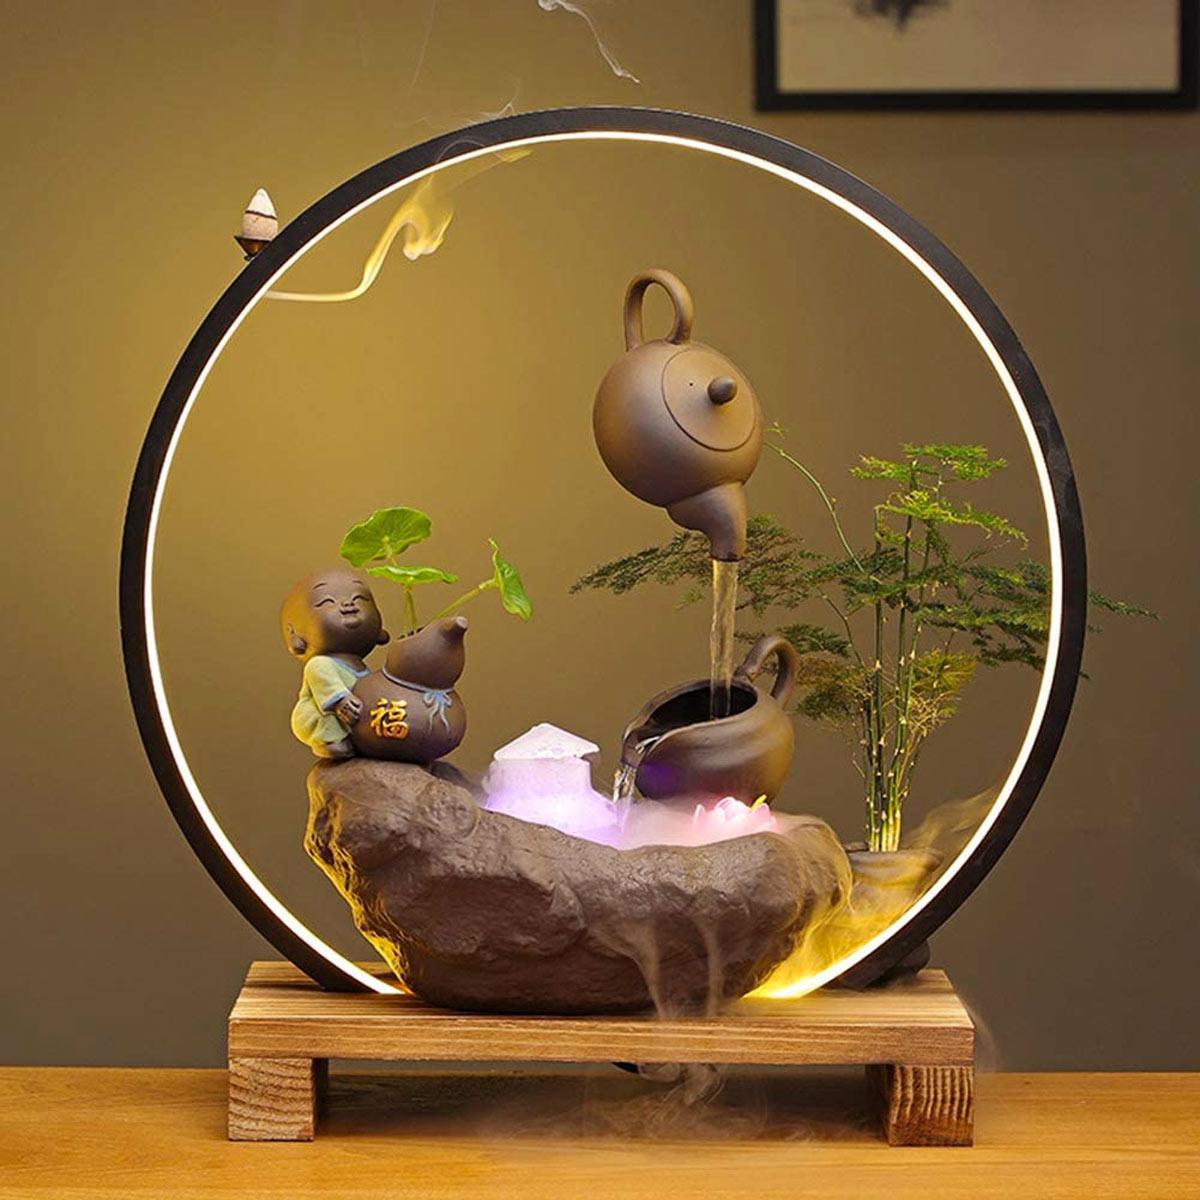 fontanella da interno zen